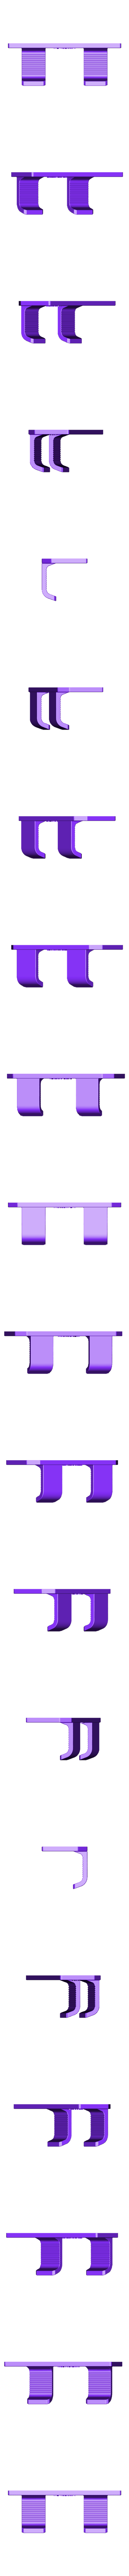 enforce_20_screws.stl Download free STL file Tool Holder for Claw Hammer 20oz / for screws or peg board • 3D printer model, Wiesemann1893